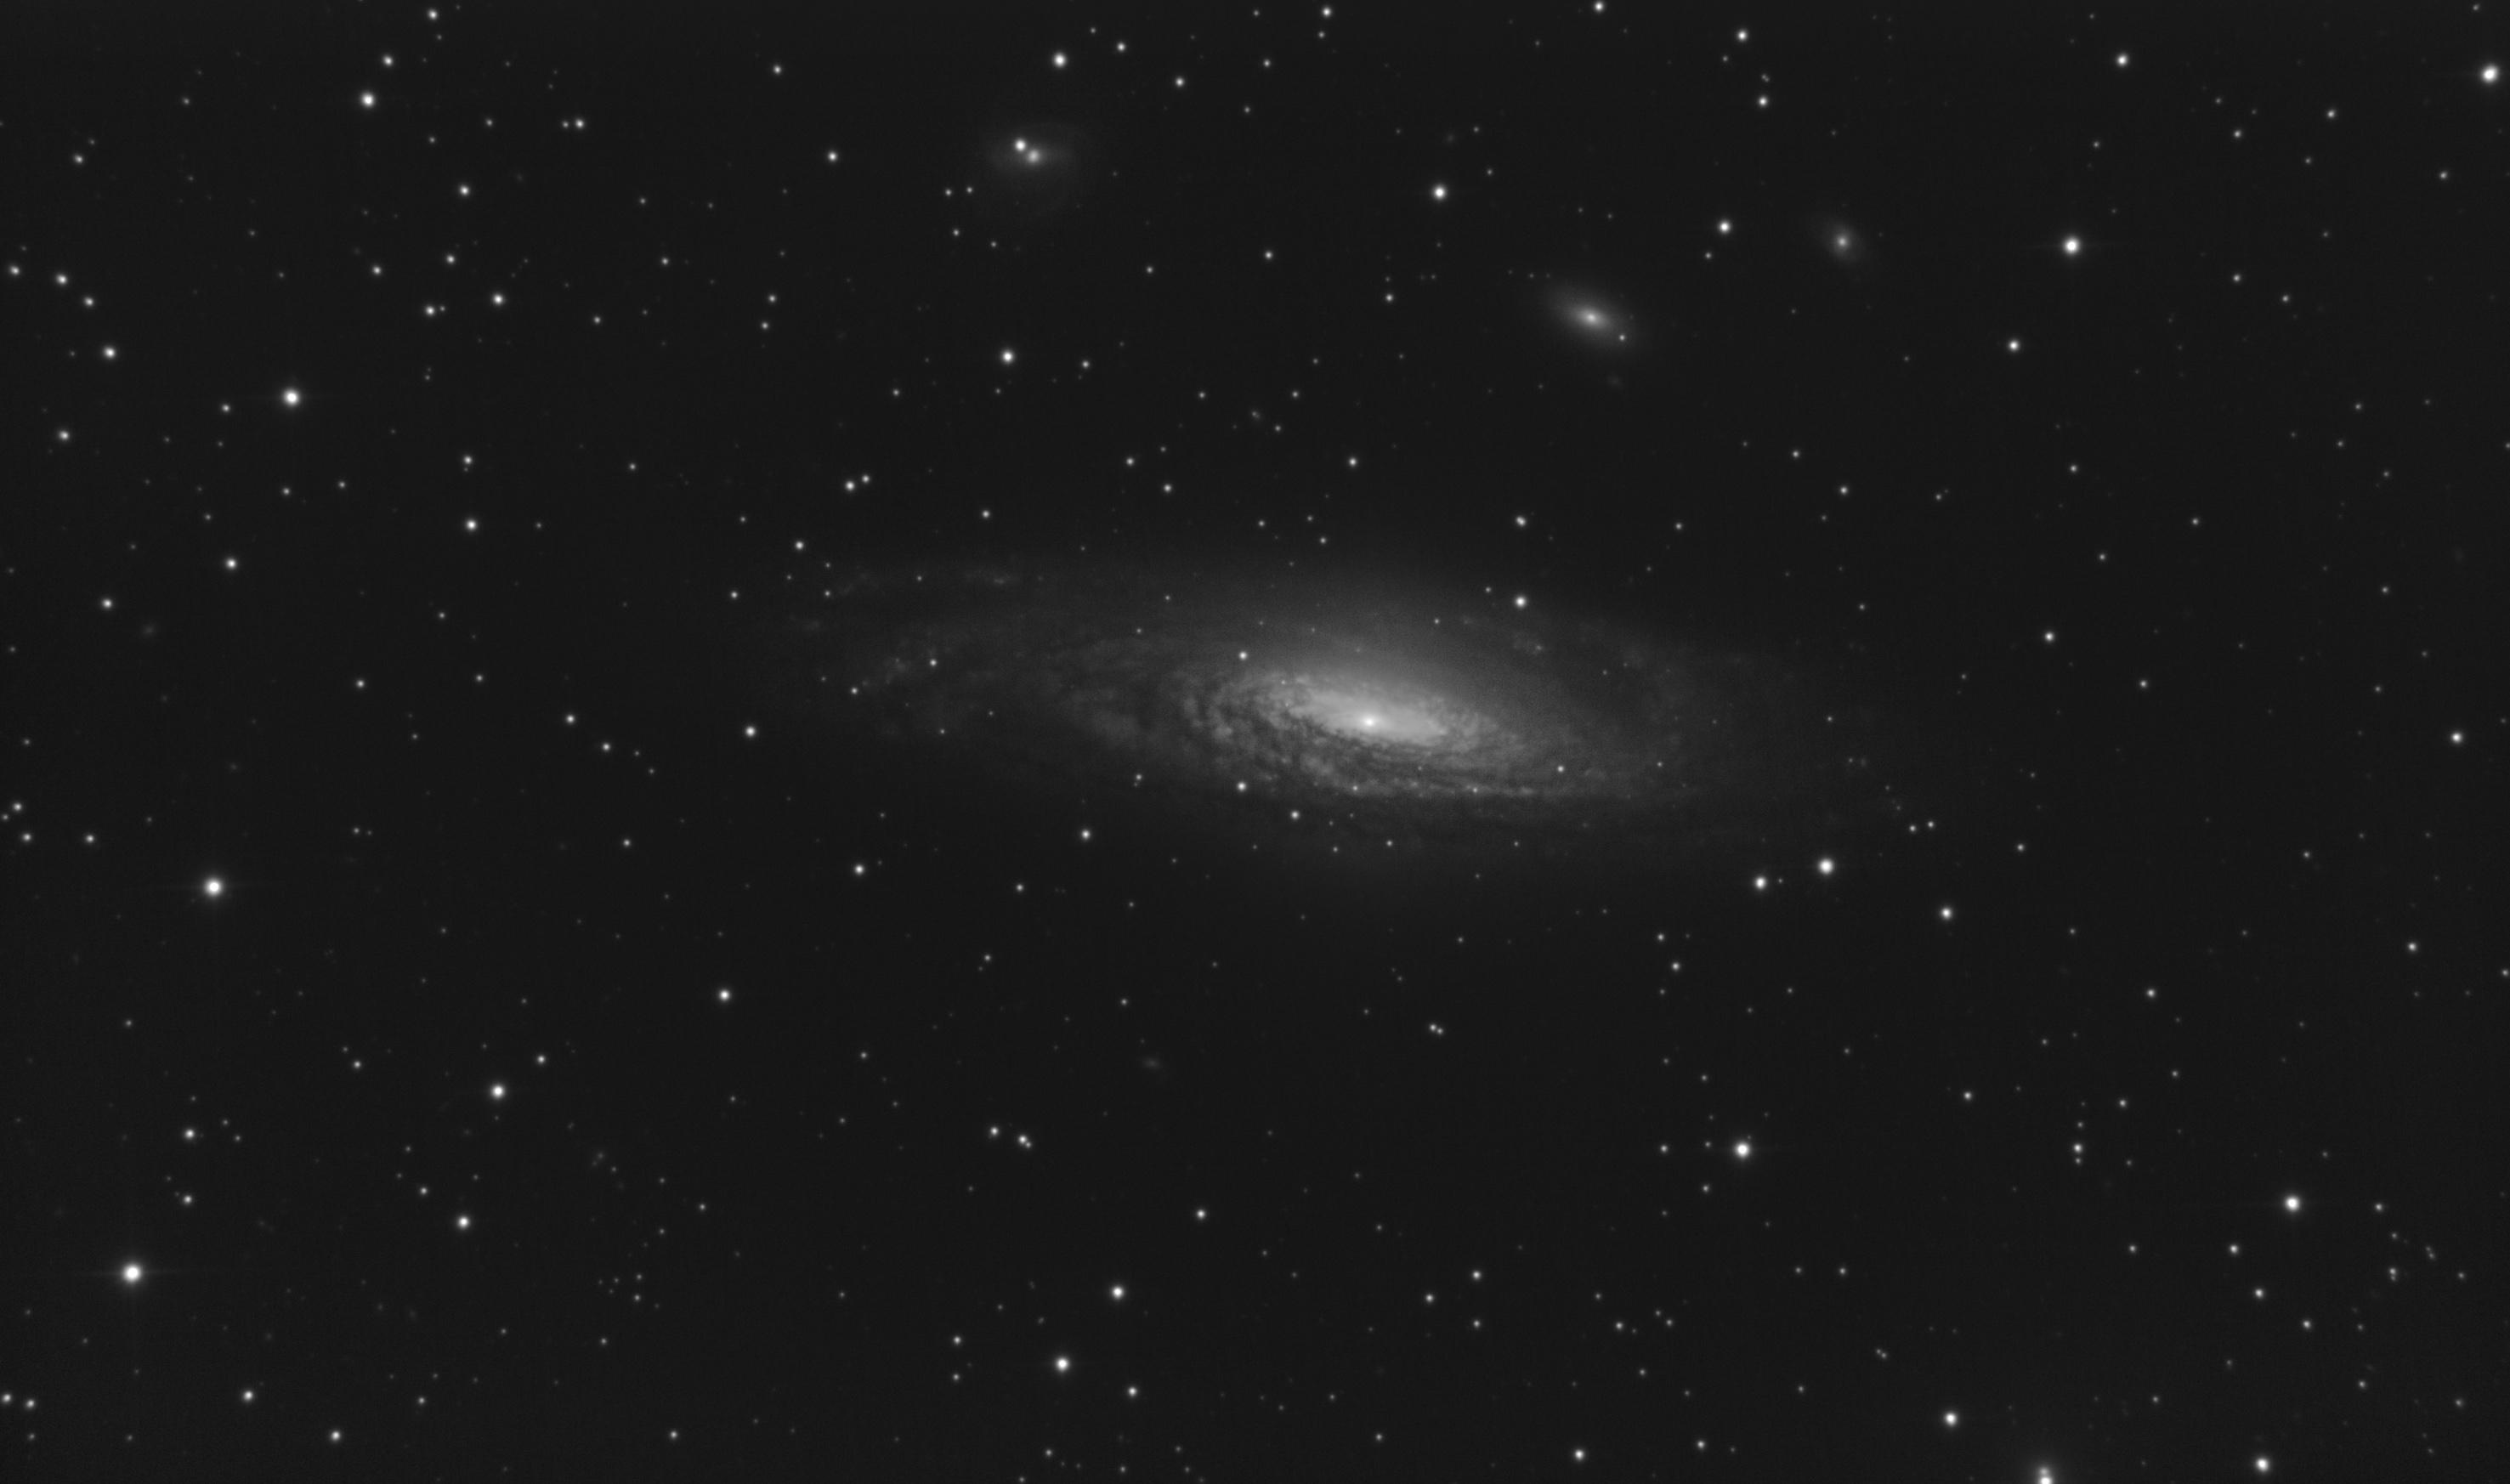 NGC 7331 au T250 122643-1533936385